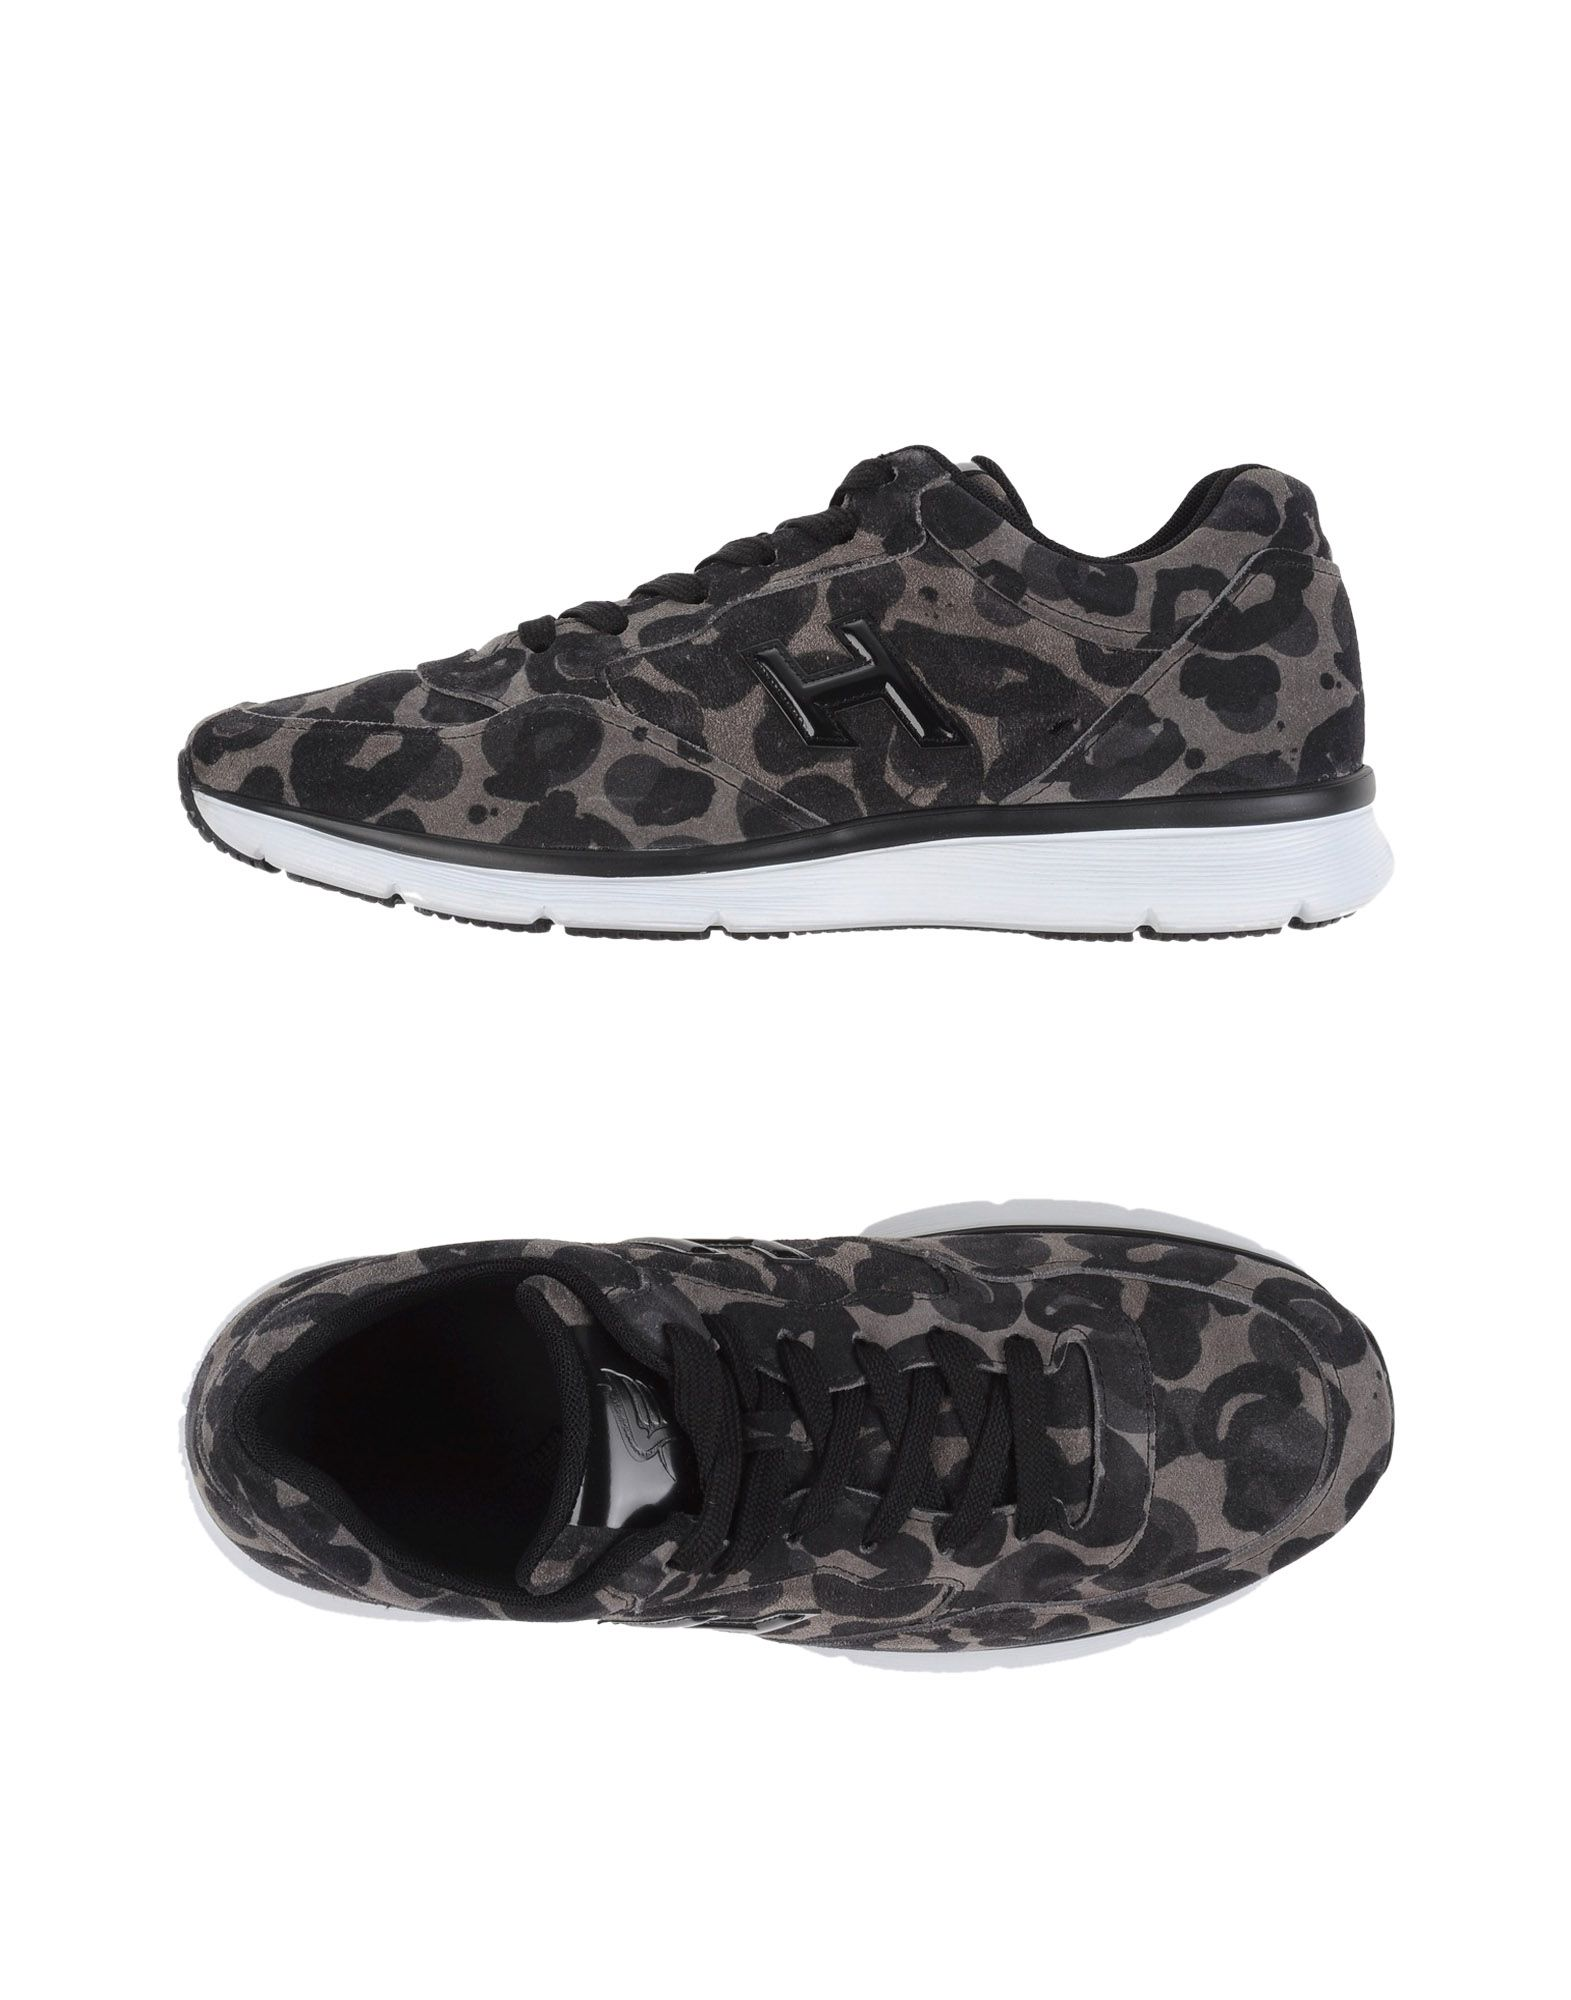 Moda Sneakers Hogan Uomo - 11177101JD